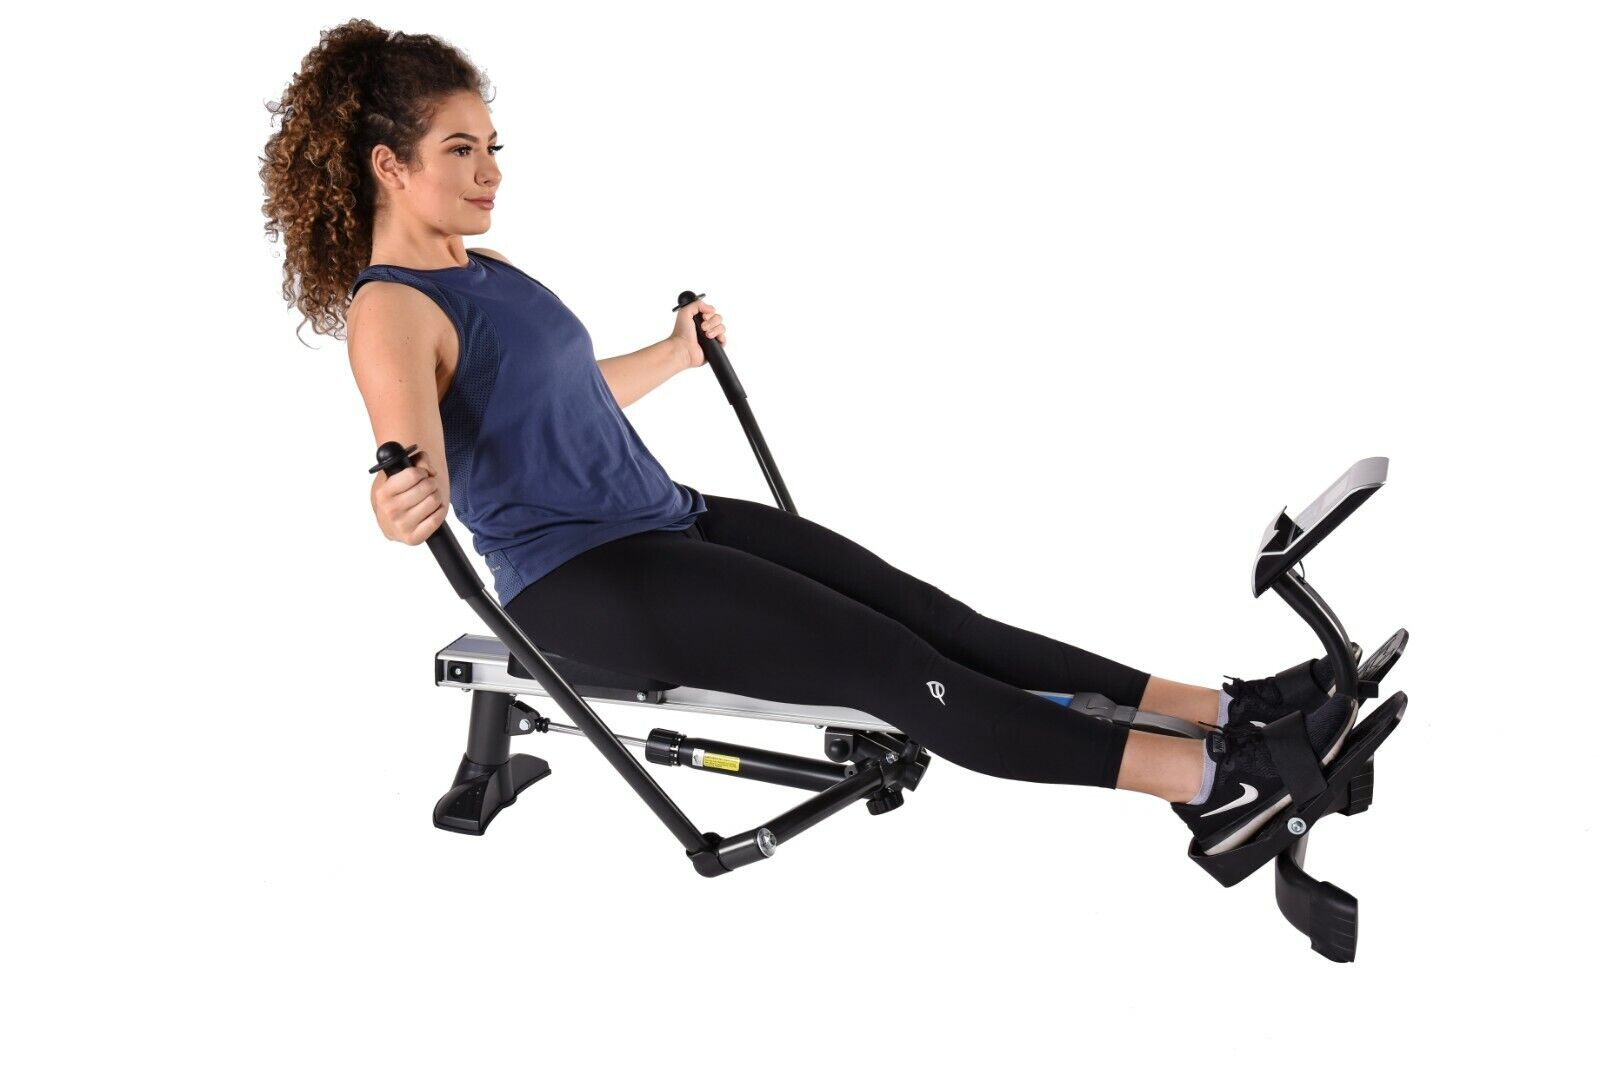 Stamina BODY TRAC GLIDER Rowing Machine 1052